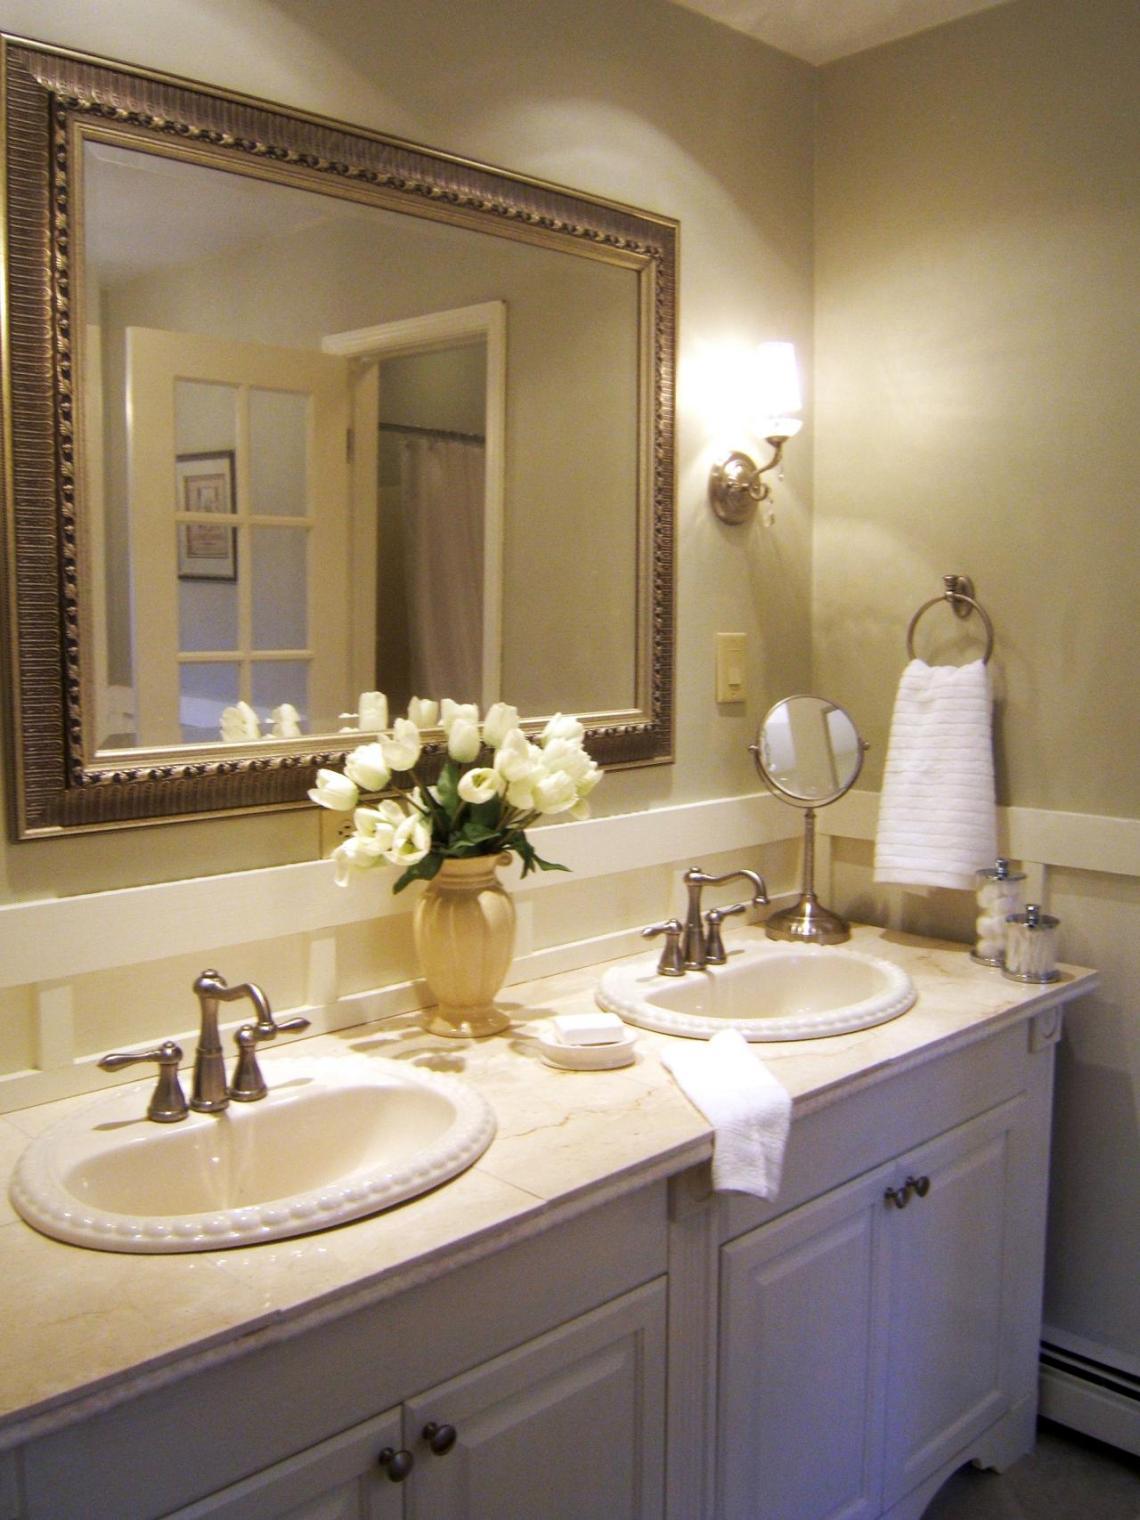 25 Relaxing Spa Bathroom Design Ideas - Decoration Love